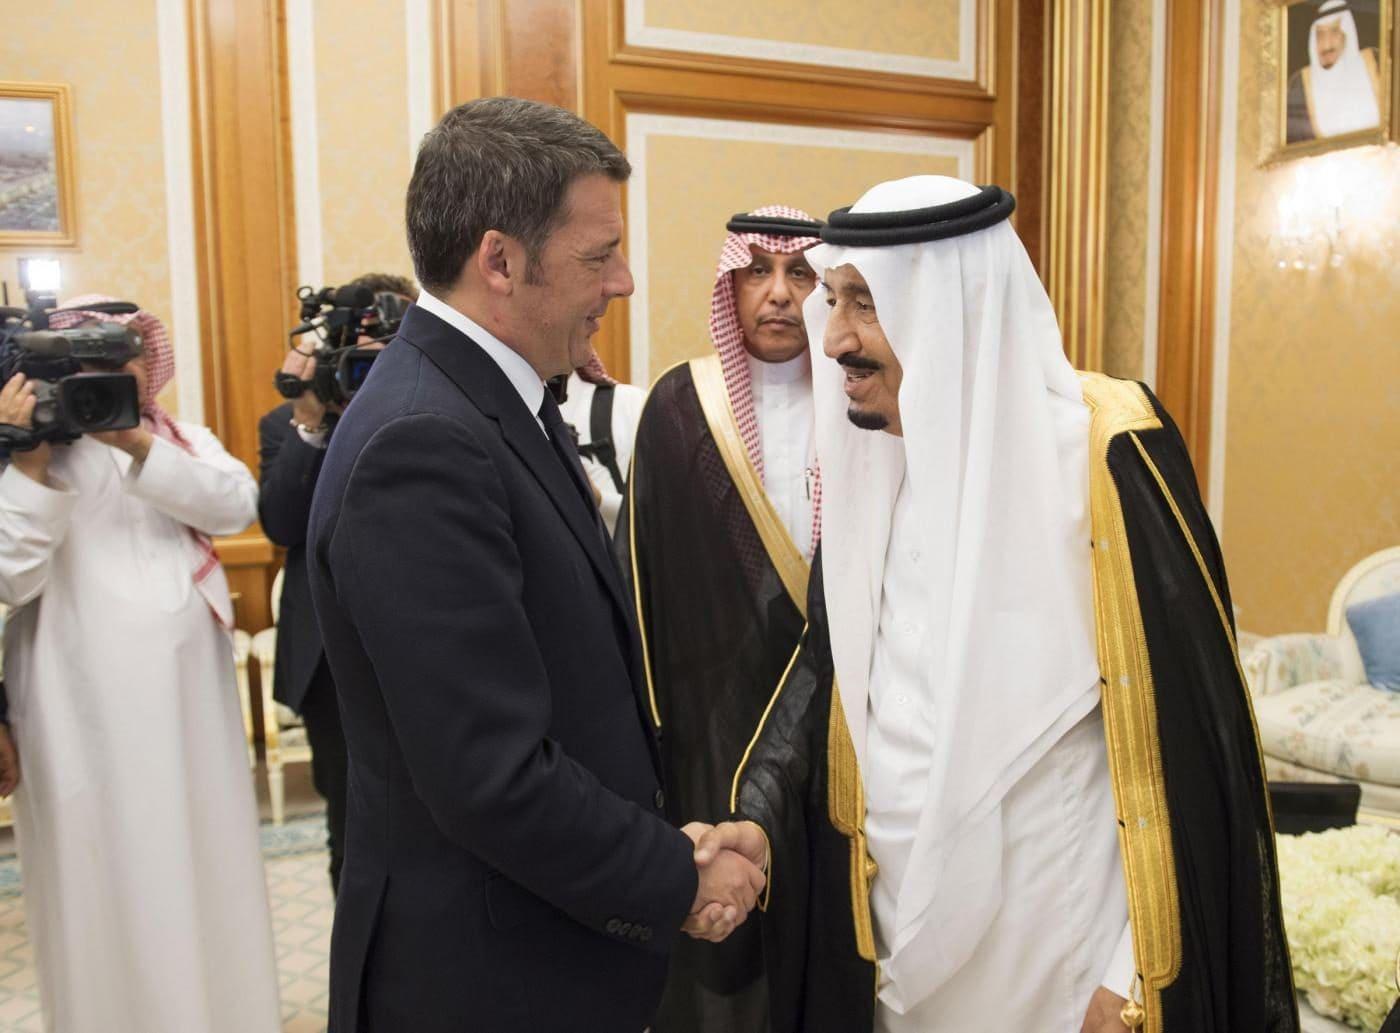 Matteo Renzi durante una visita in Arabia Saudita nel 2015